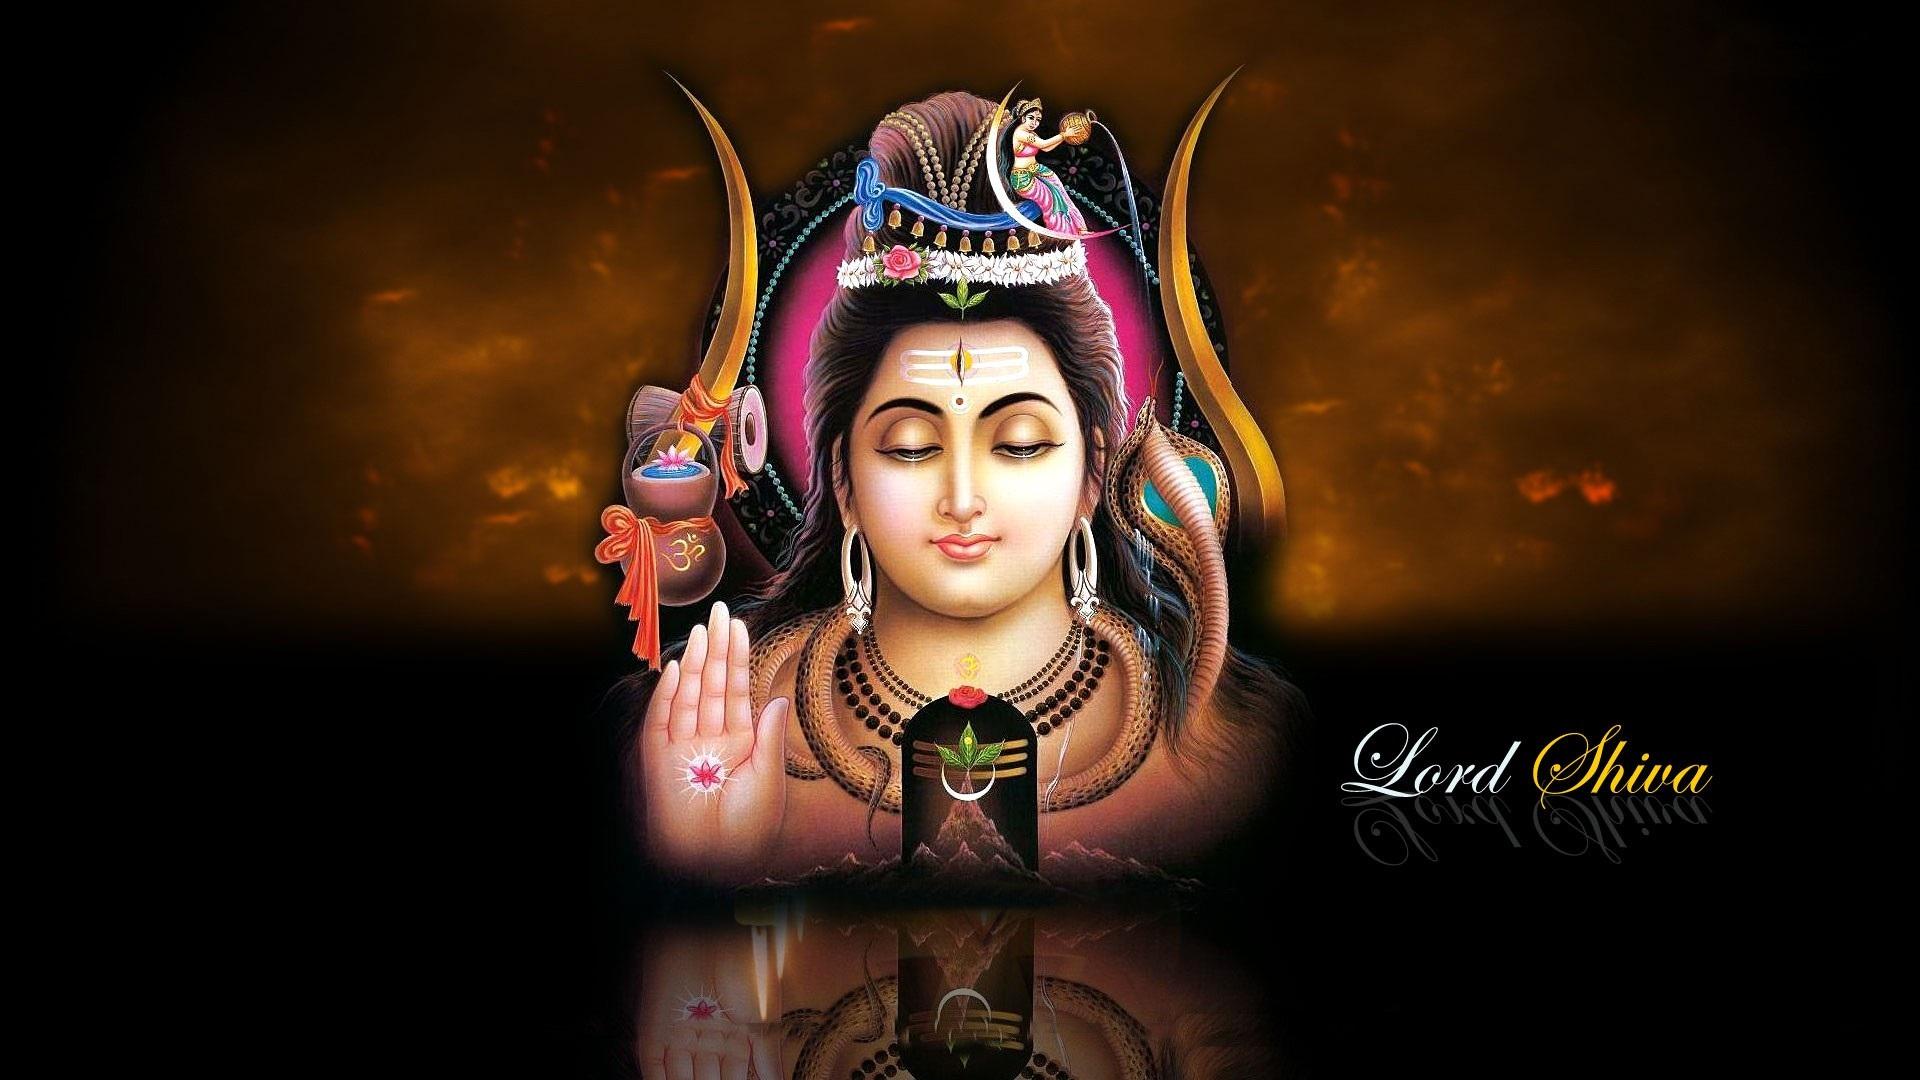 Lord Shiva with shivling 2014 HD wallpaper HD Wallpapers Rocks 1920x1080